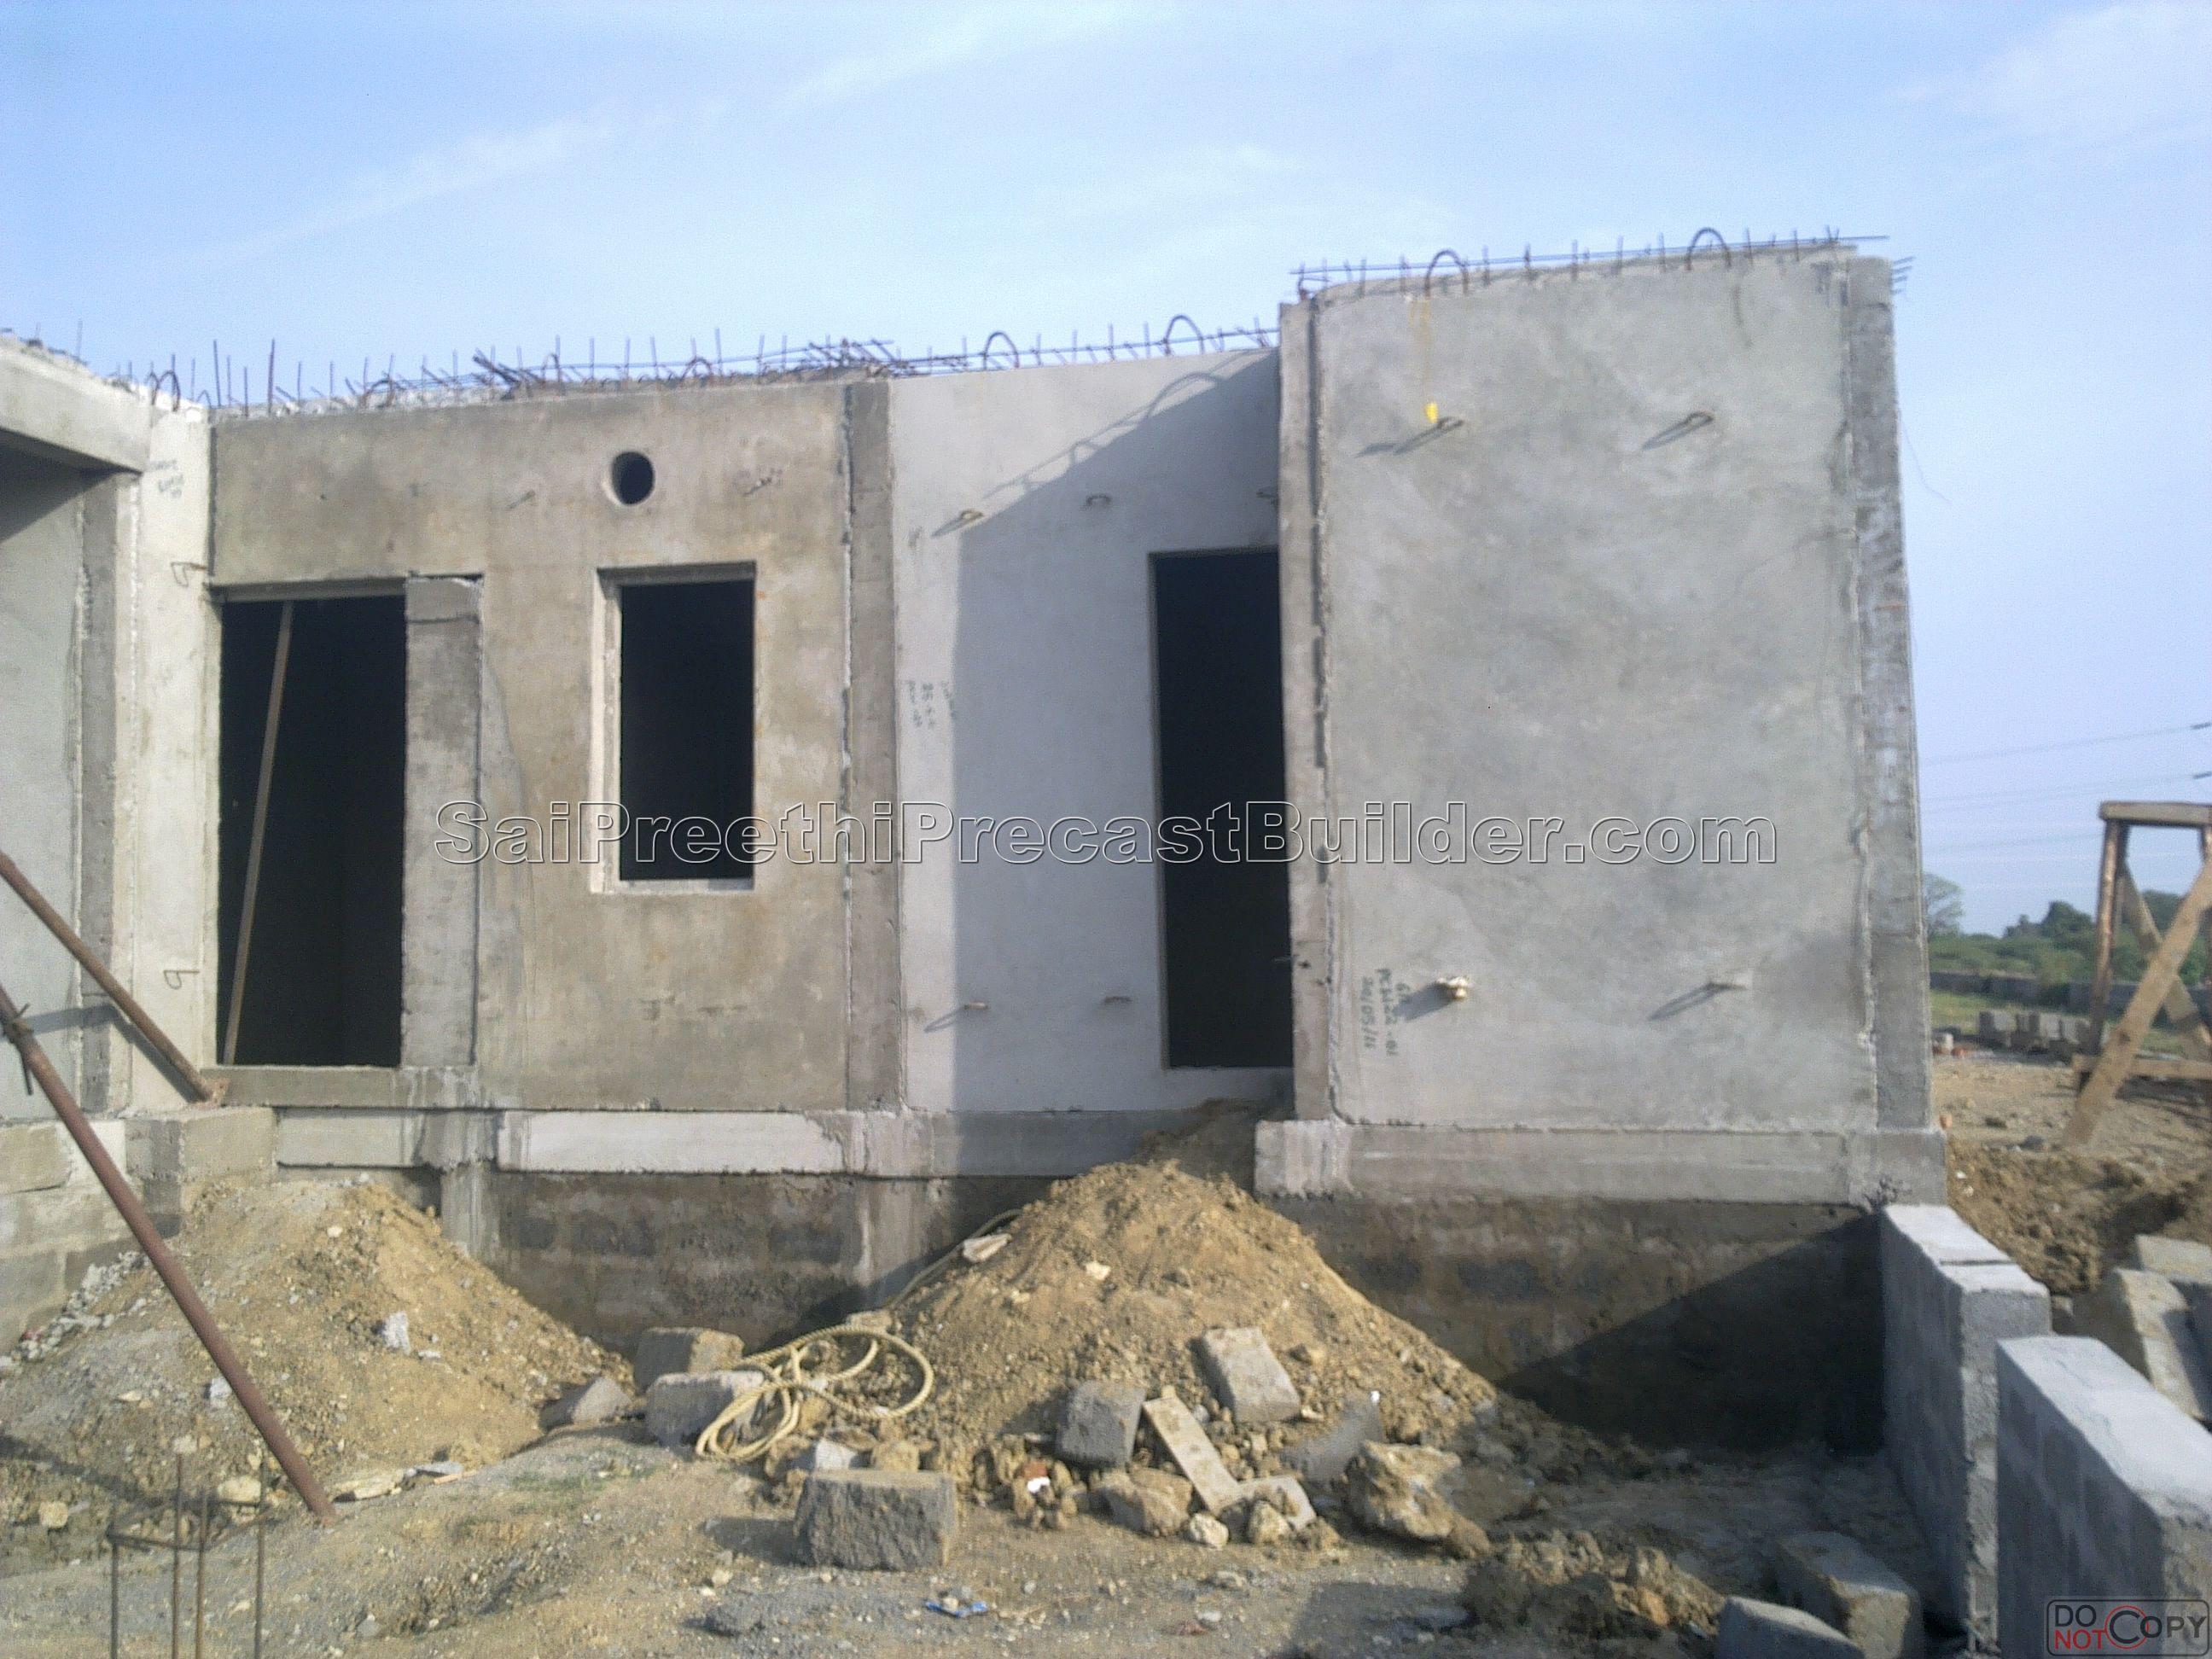 Sai preethi precast builder residential precast concrete Precast concrete residential homes